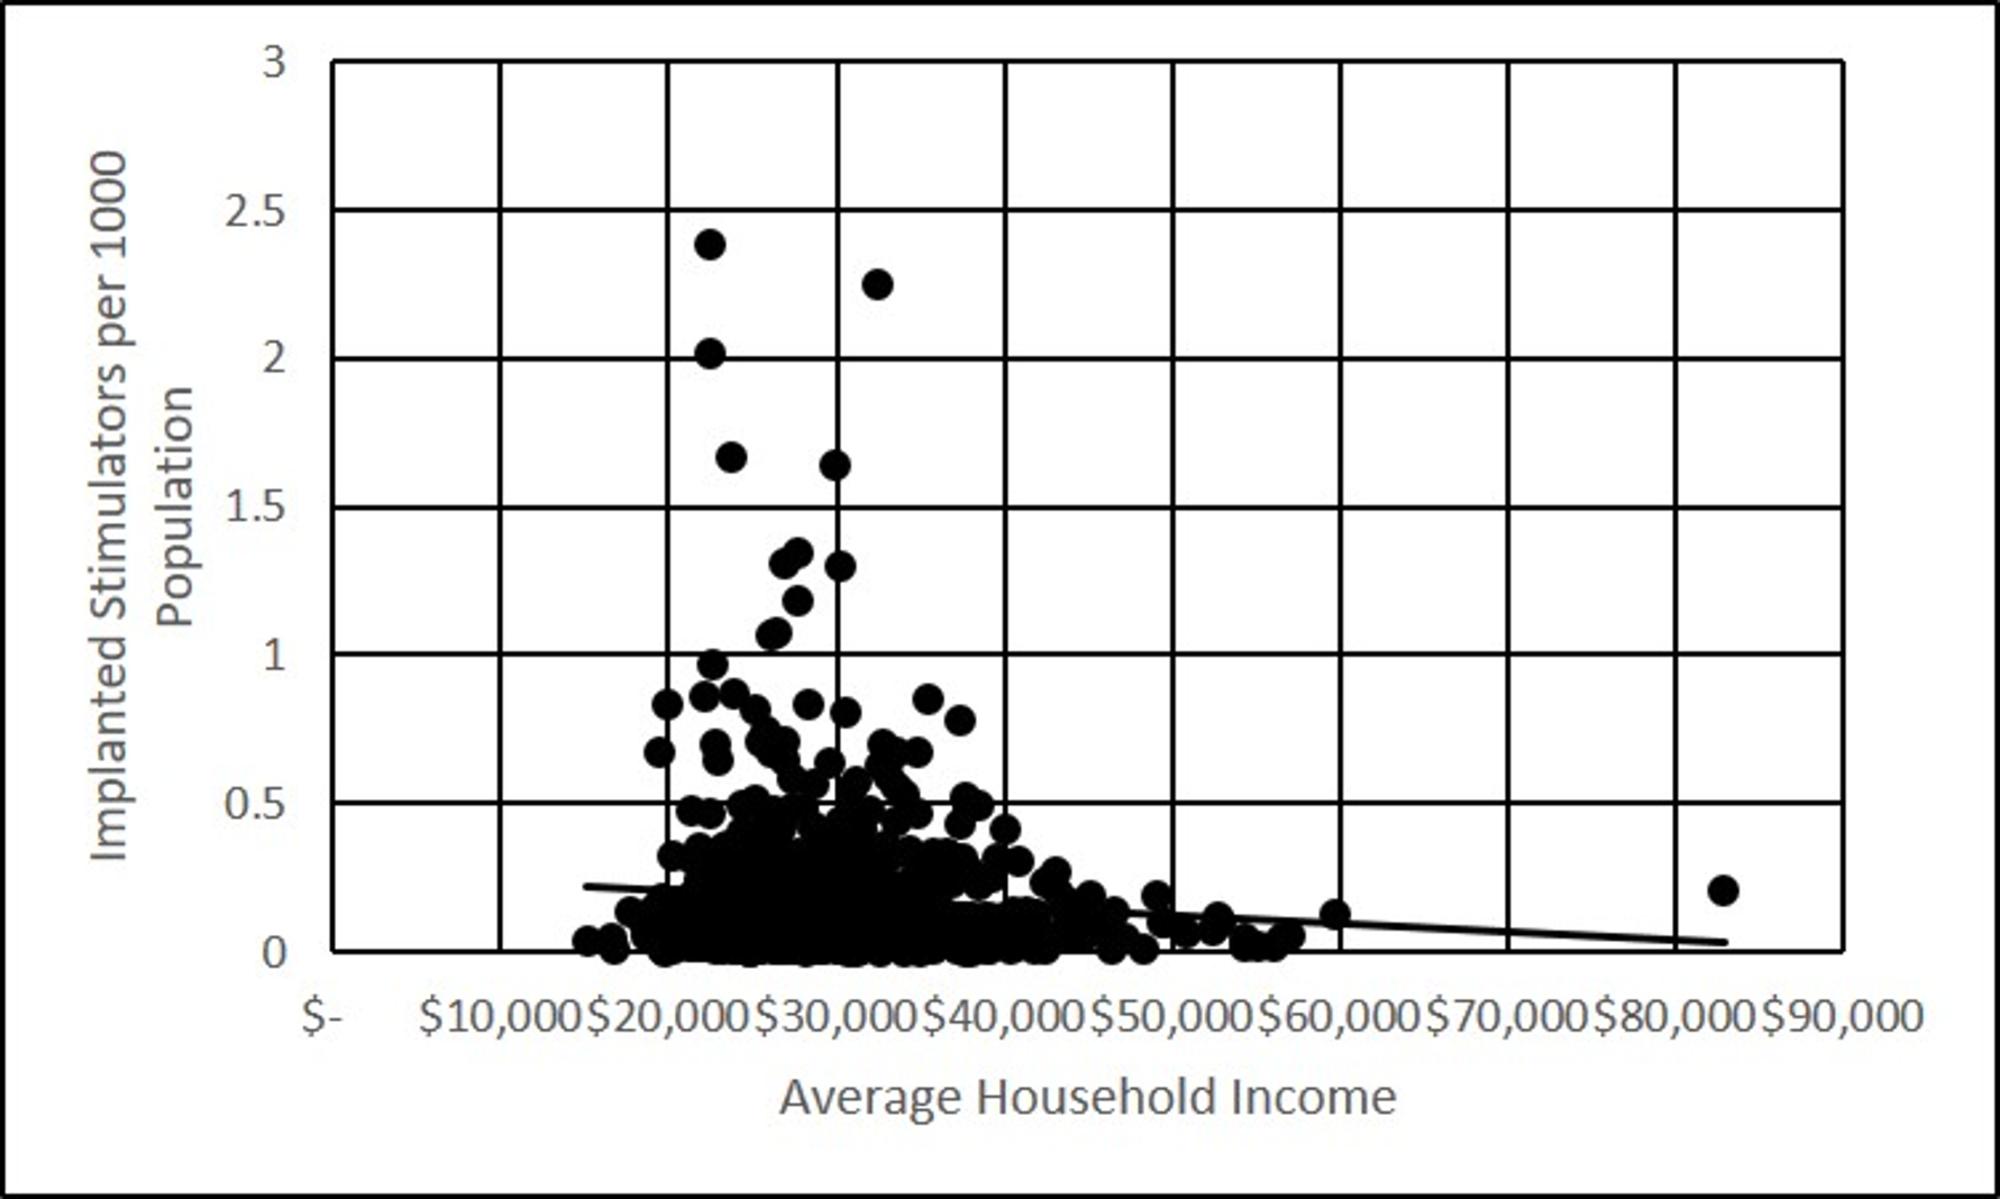 Implanted-stimulators-per-1000-people,-versus-average-household-income